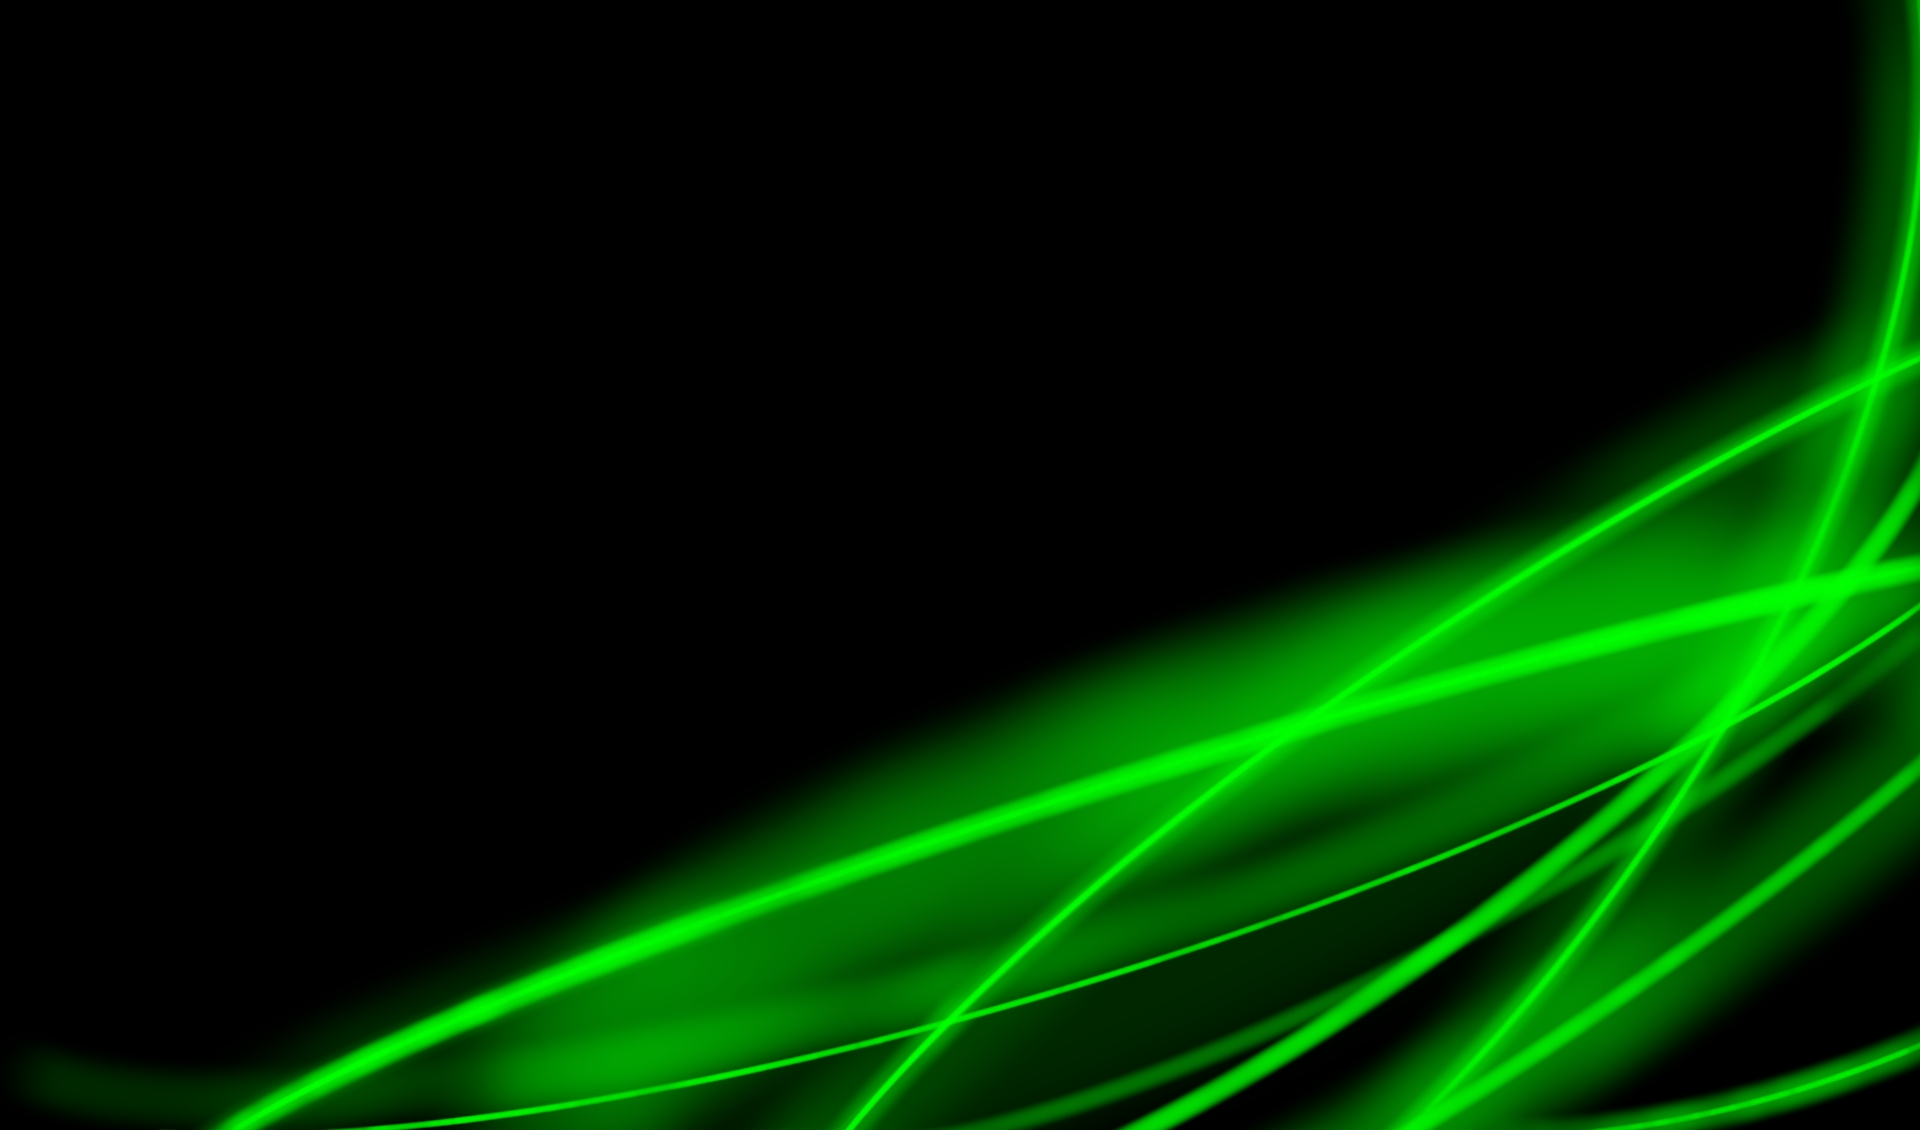 Neon Background v1 by Dragon Dew 1920x1130